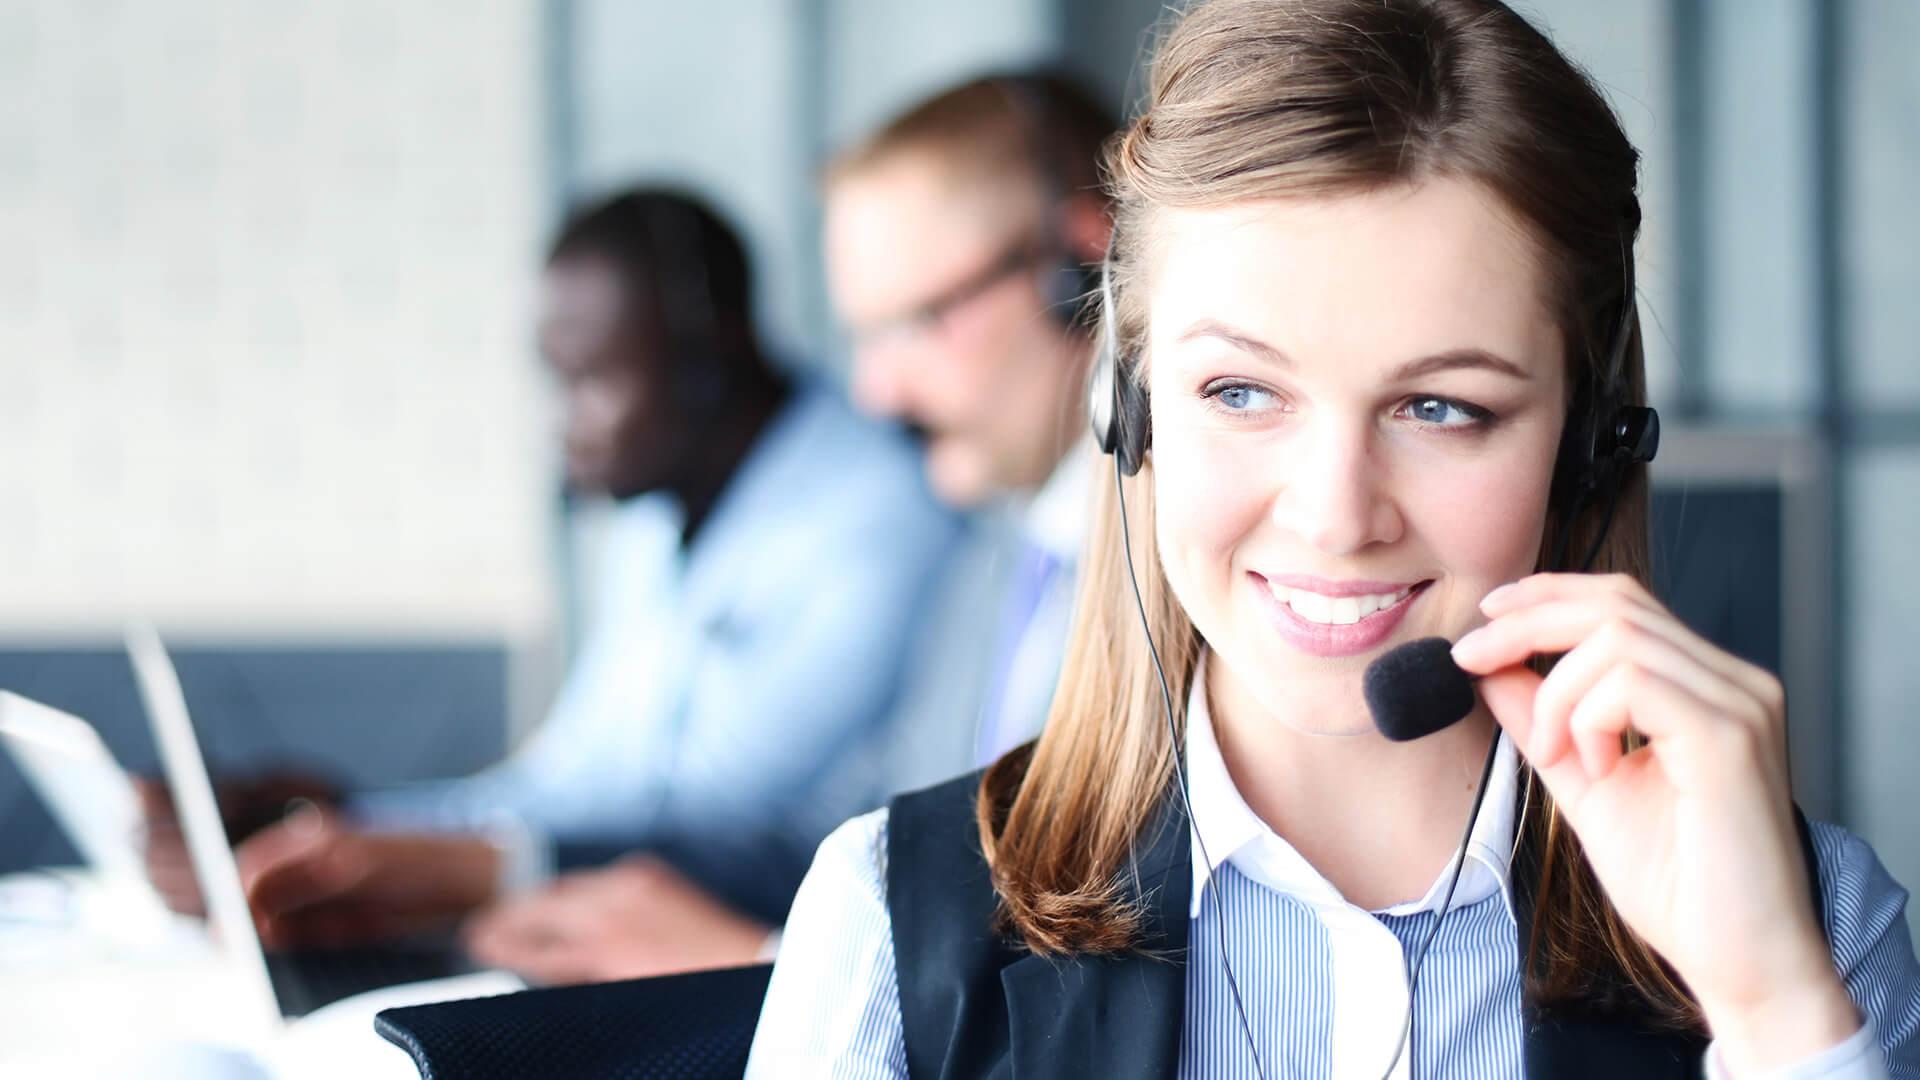 Provide specific customer support